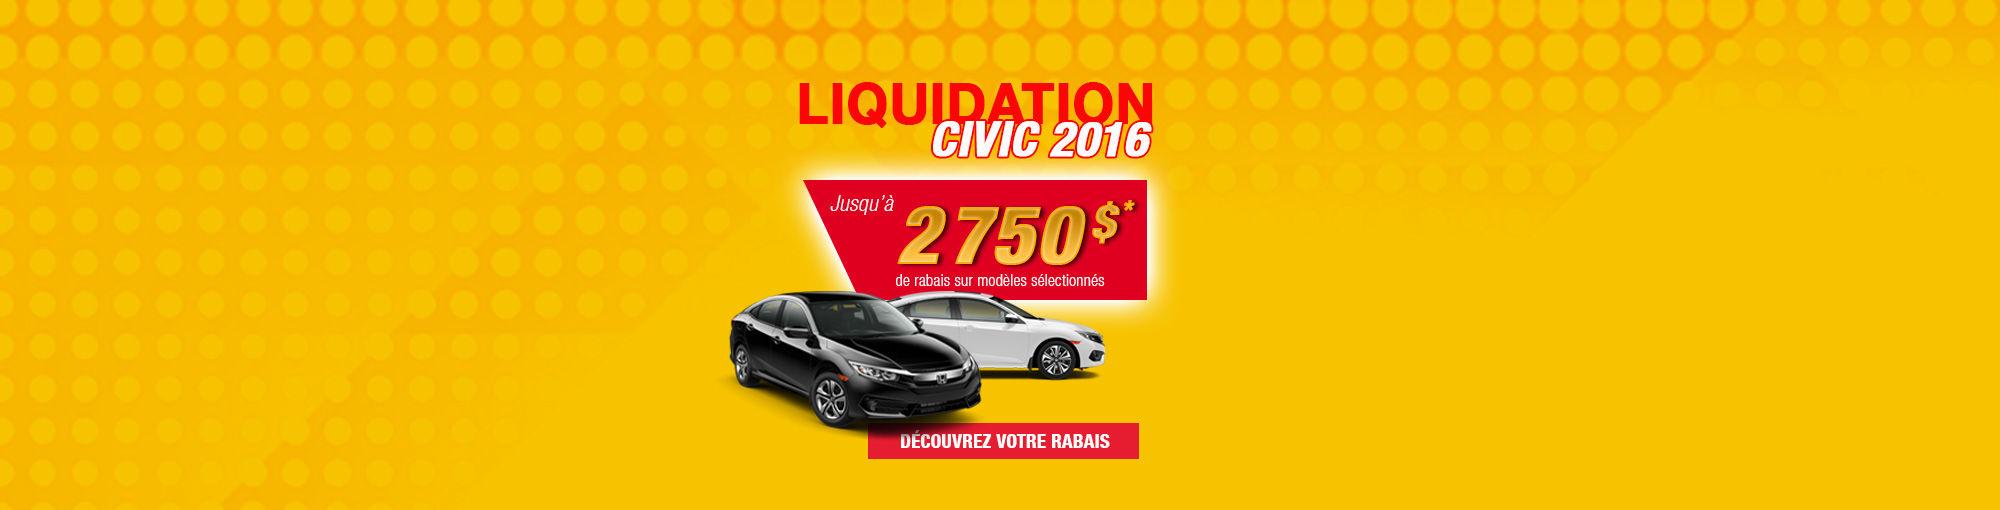 Liquidation civic 2016 (février 2017)